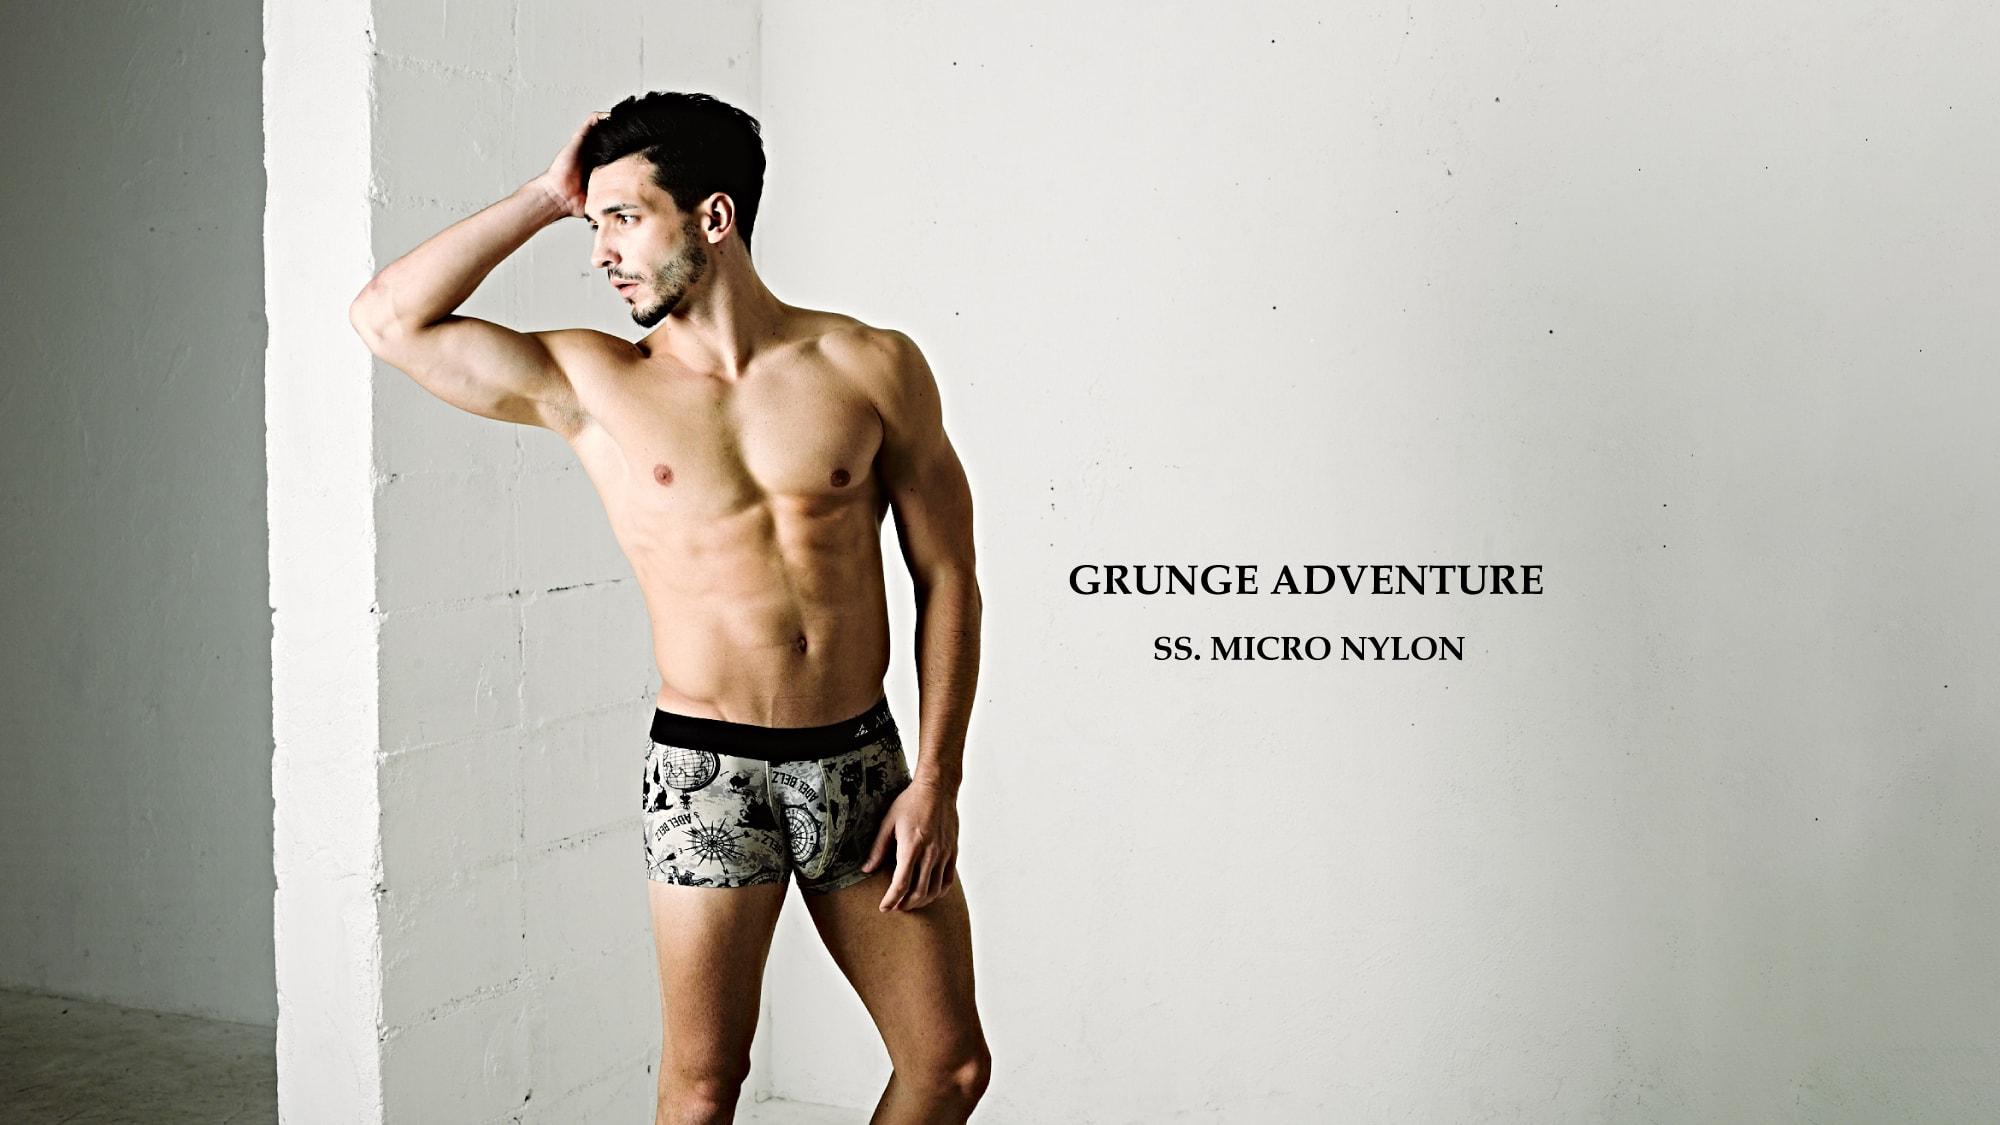 GRUNGE ADVENTURE | 男性下着 高級 ボクサーパンツ メンズ ブランド 日本製、Adelbelz(アデルベルツ)公式通販